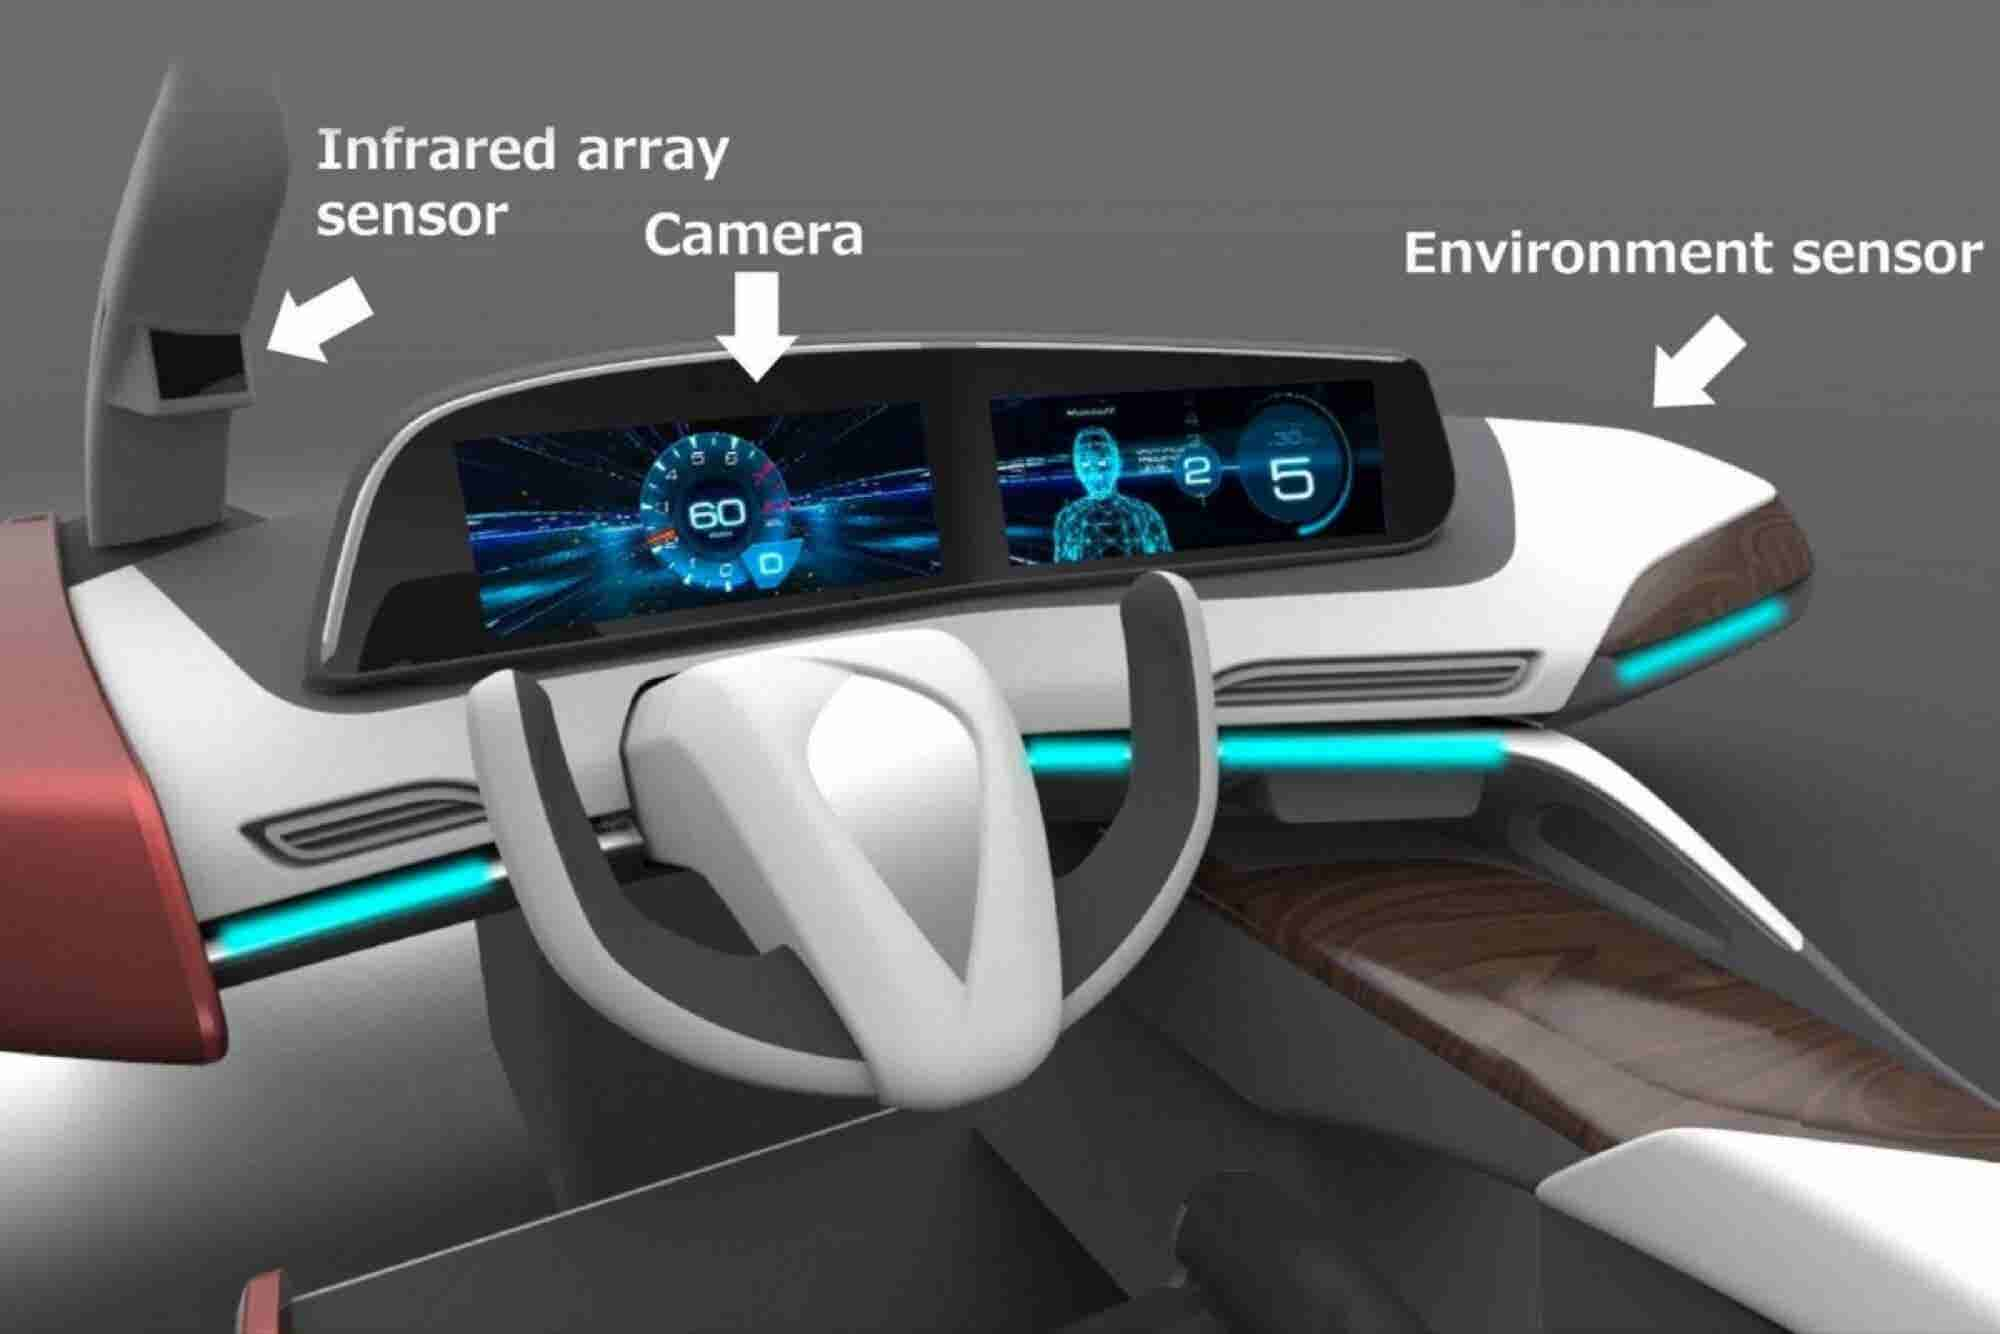 Panasonic Uses AI to Keep Drowsy Drivers Awake